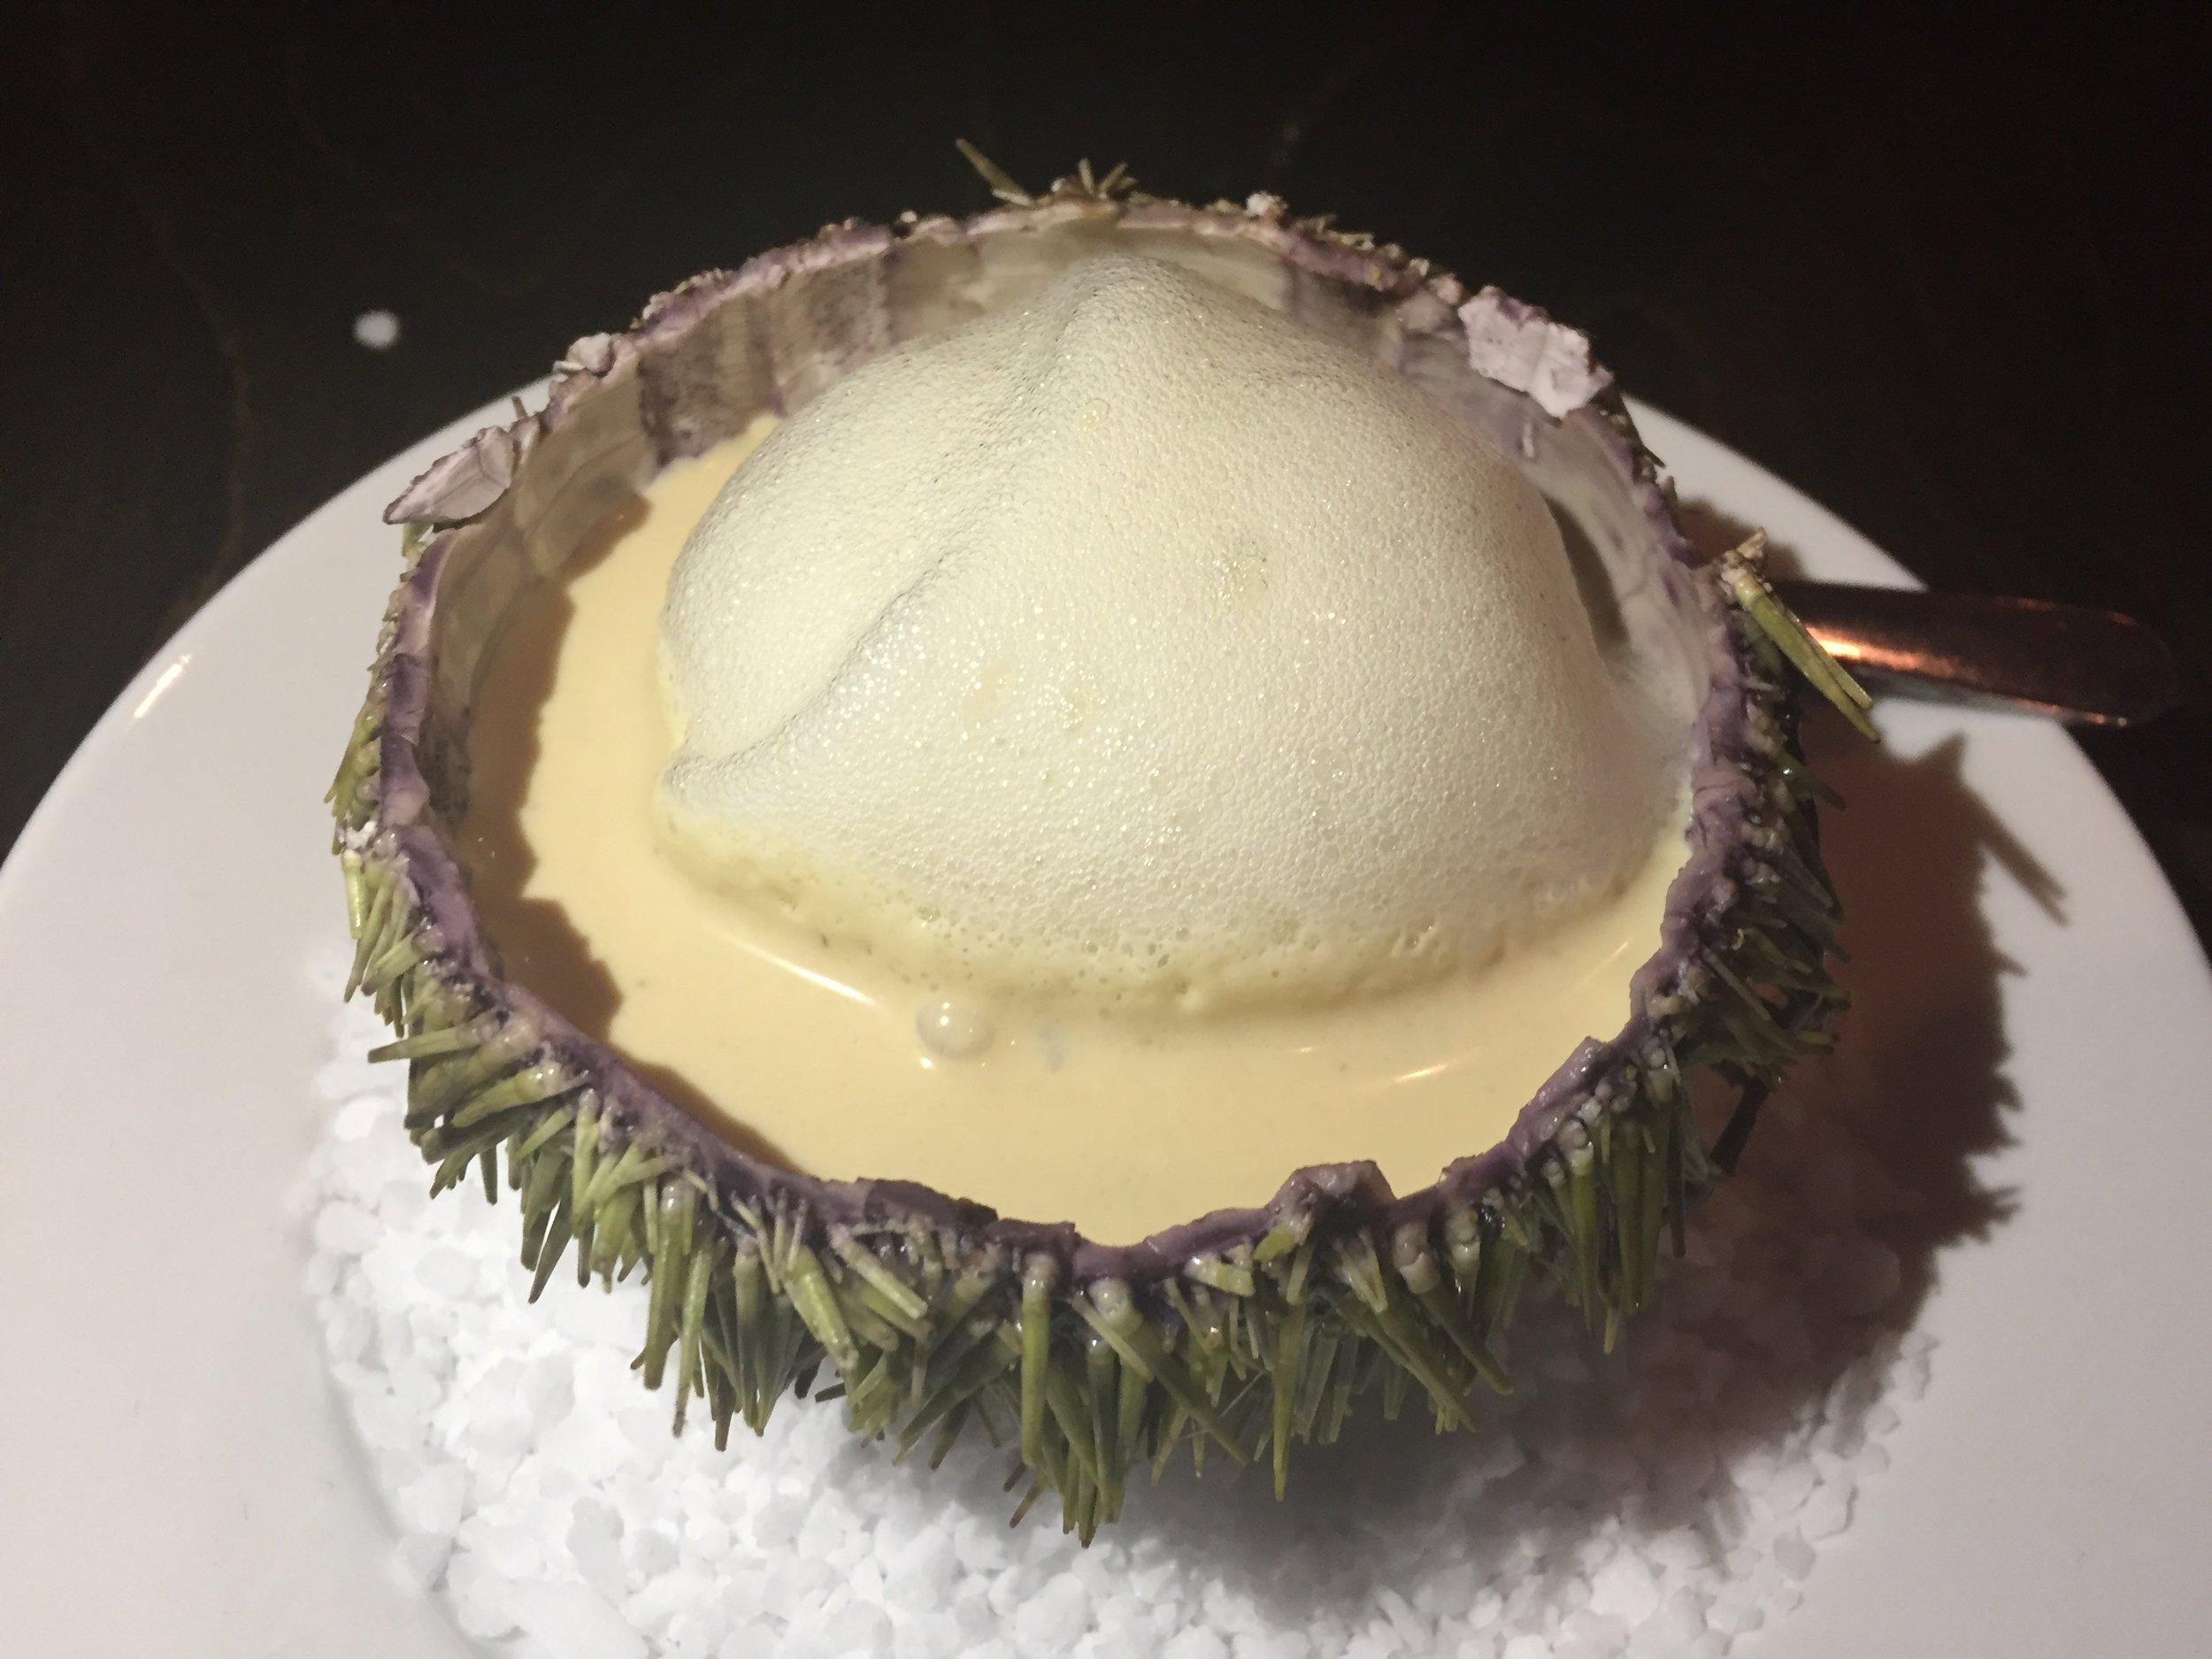 Sea urchin with a garlic, onion foie gras cream